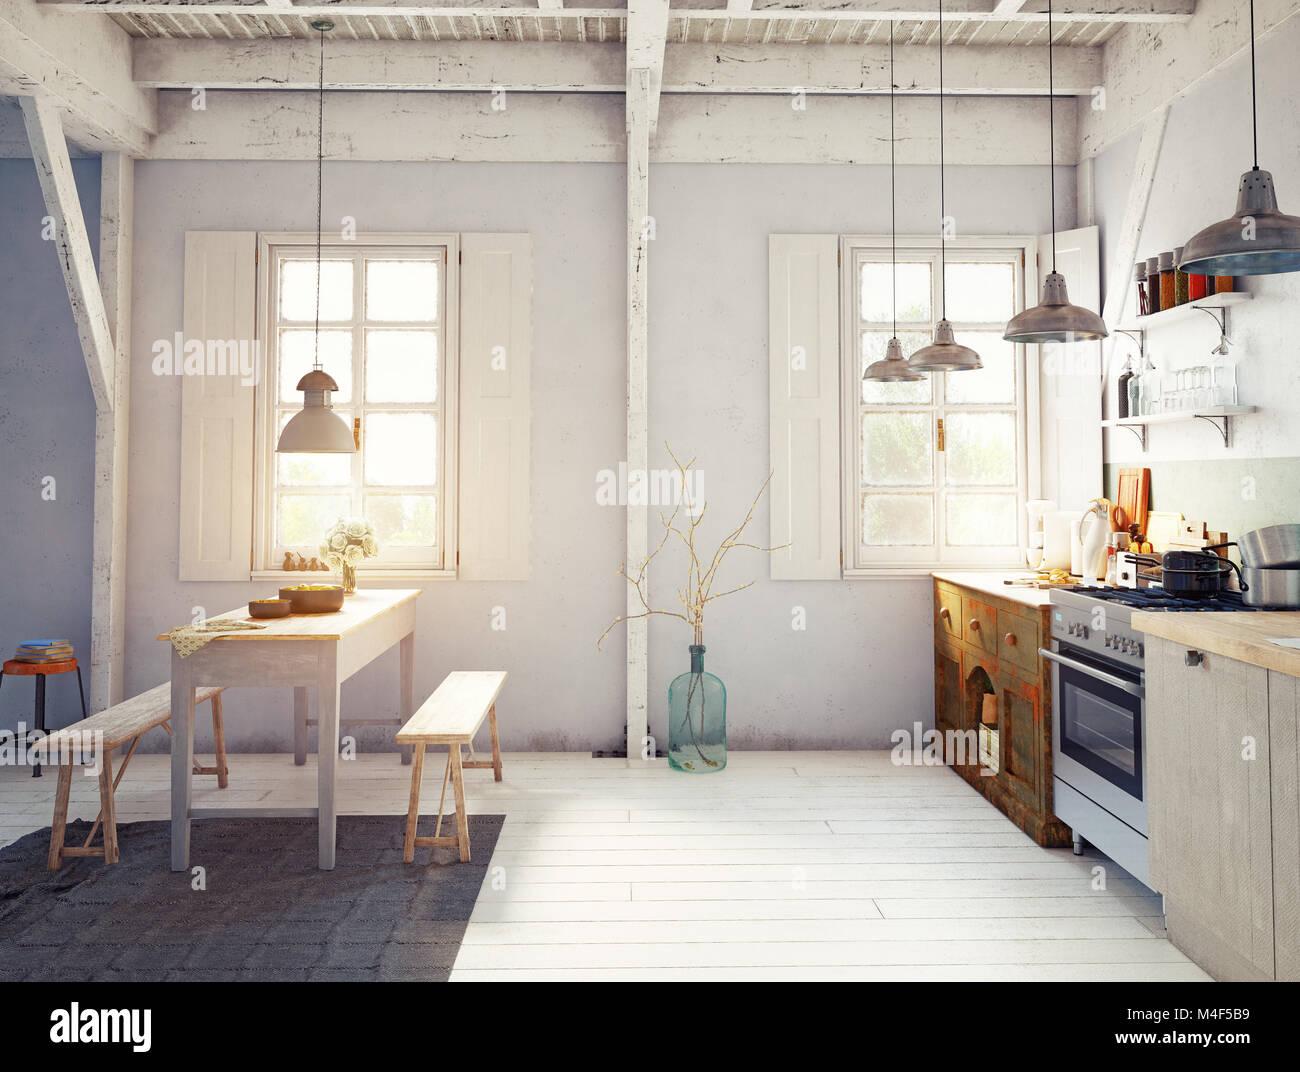 Vintage Style Küche Interieur. 3D-rendering Konzept Design Stockfoto ...